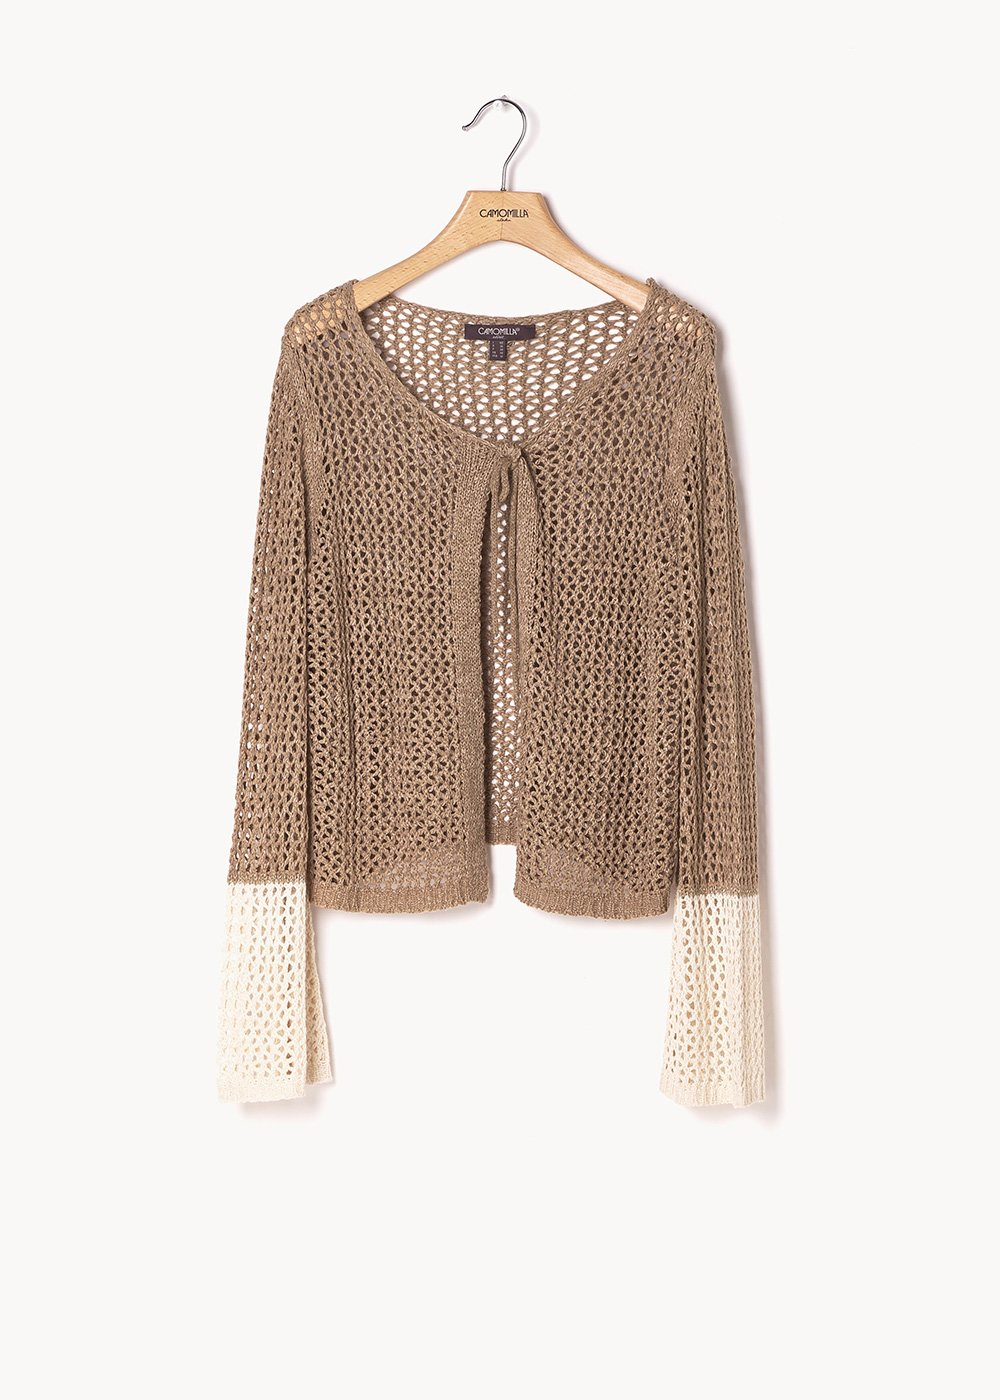 Clayd two-tone shrug with flared sleeve - Desert / L.beige - Woman